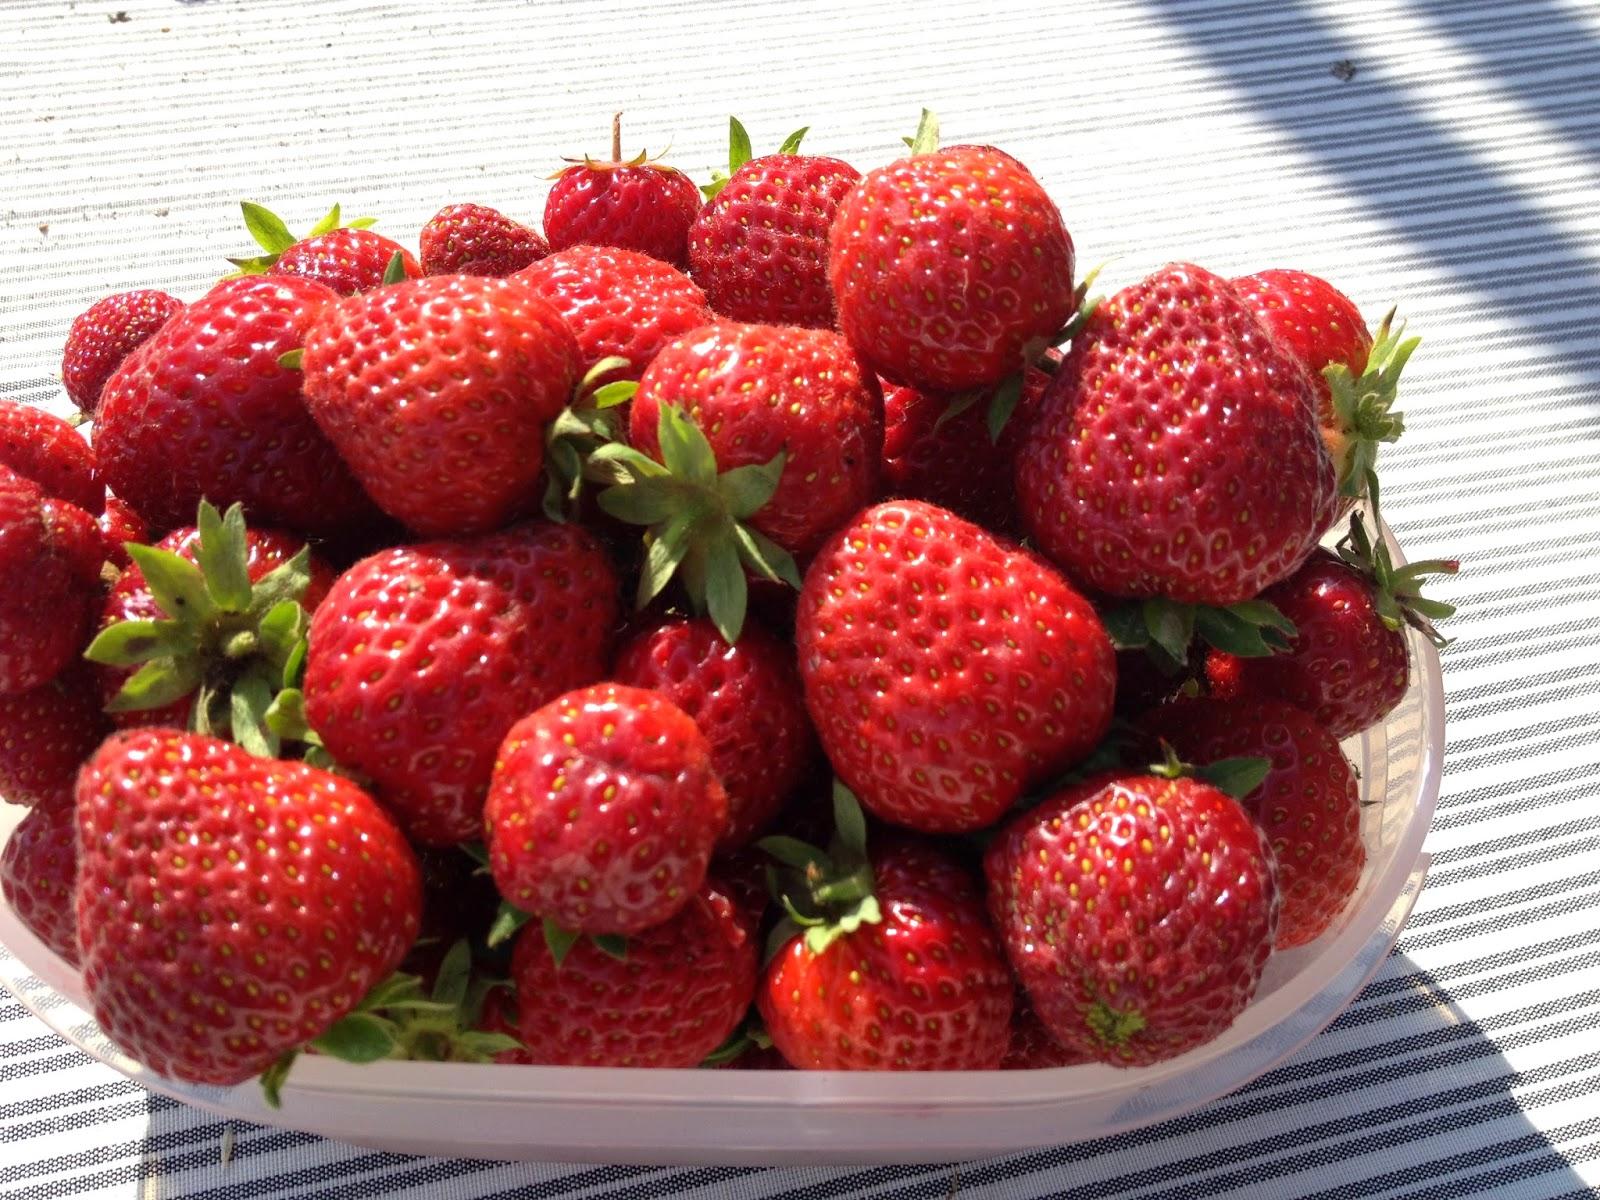 jord til jordbær